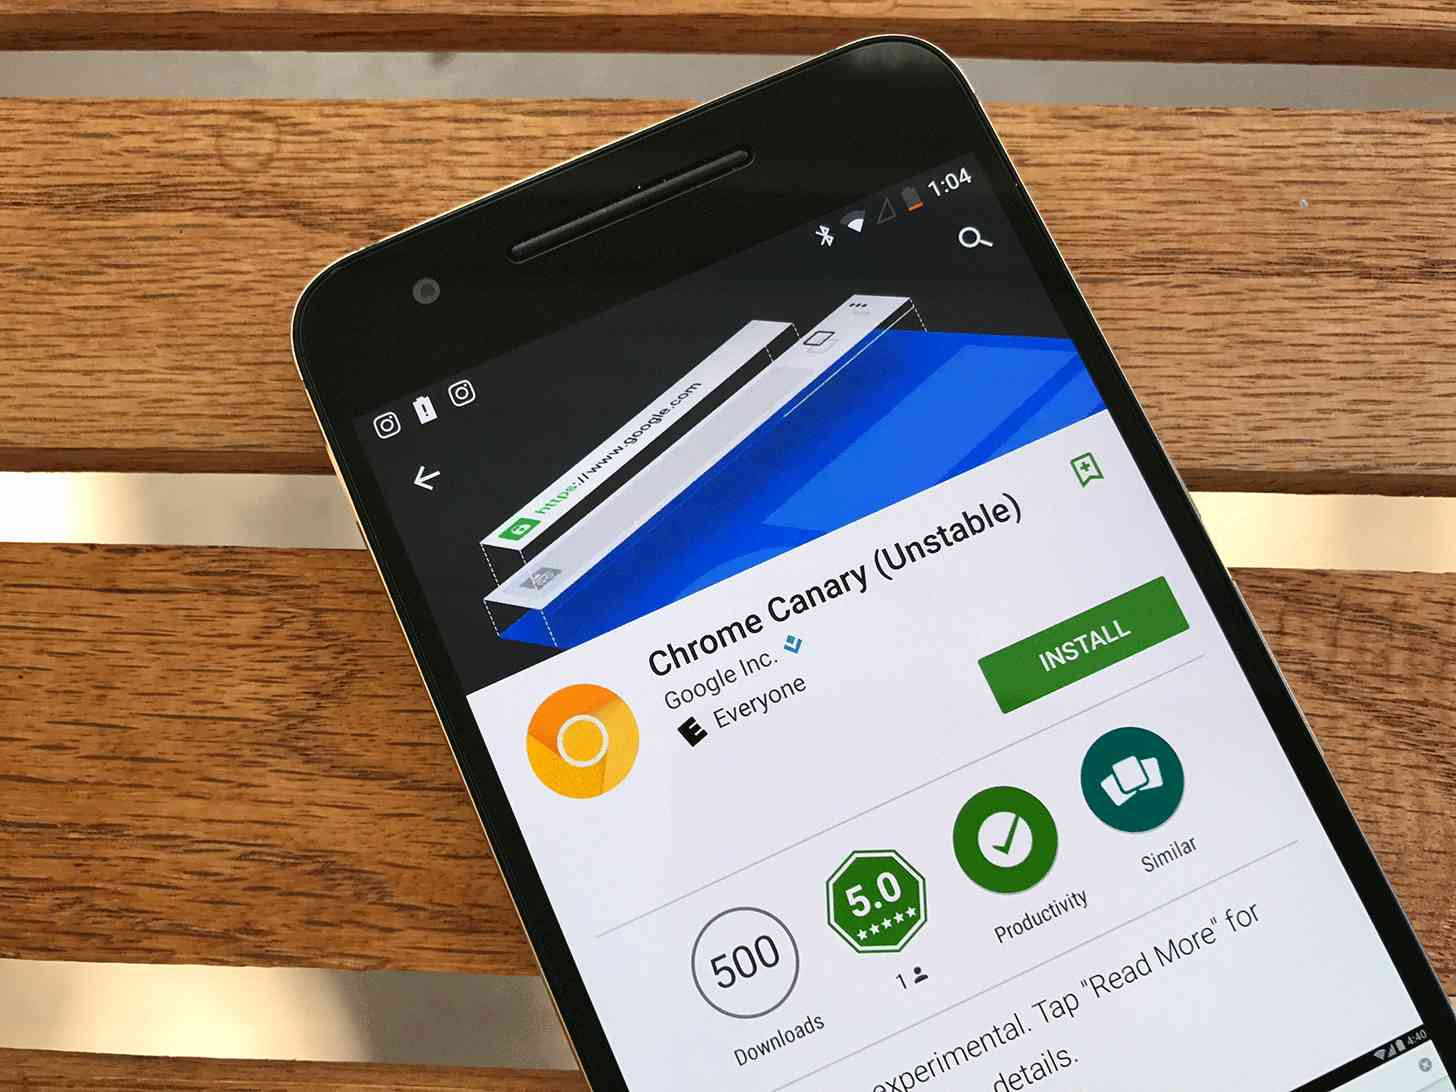 Chrome Canary Android app